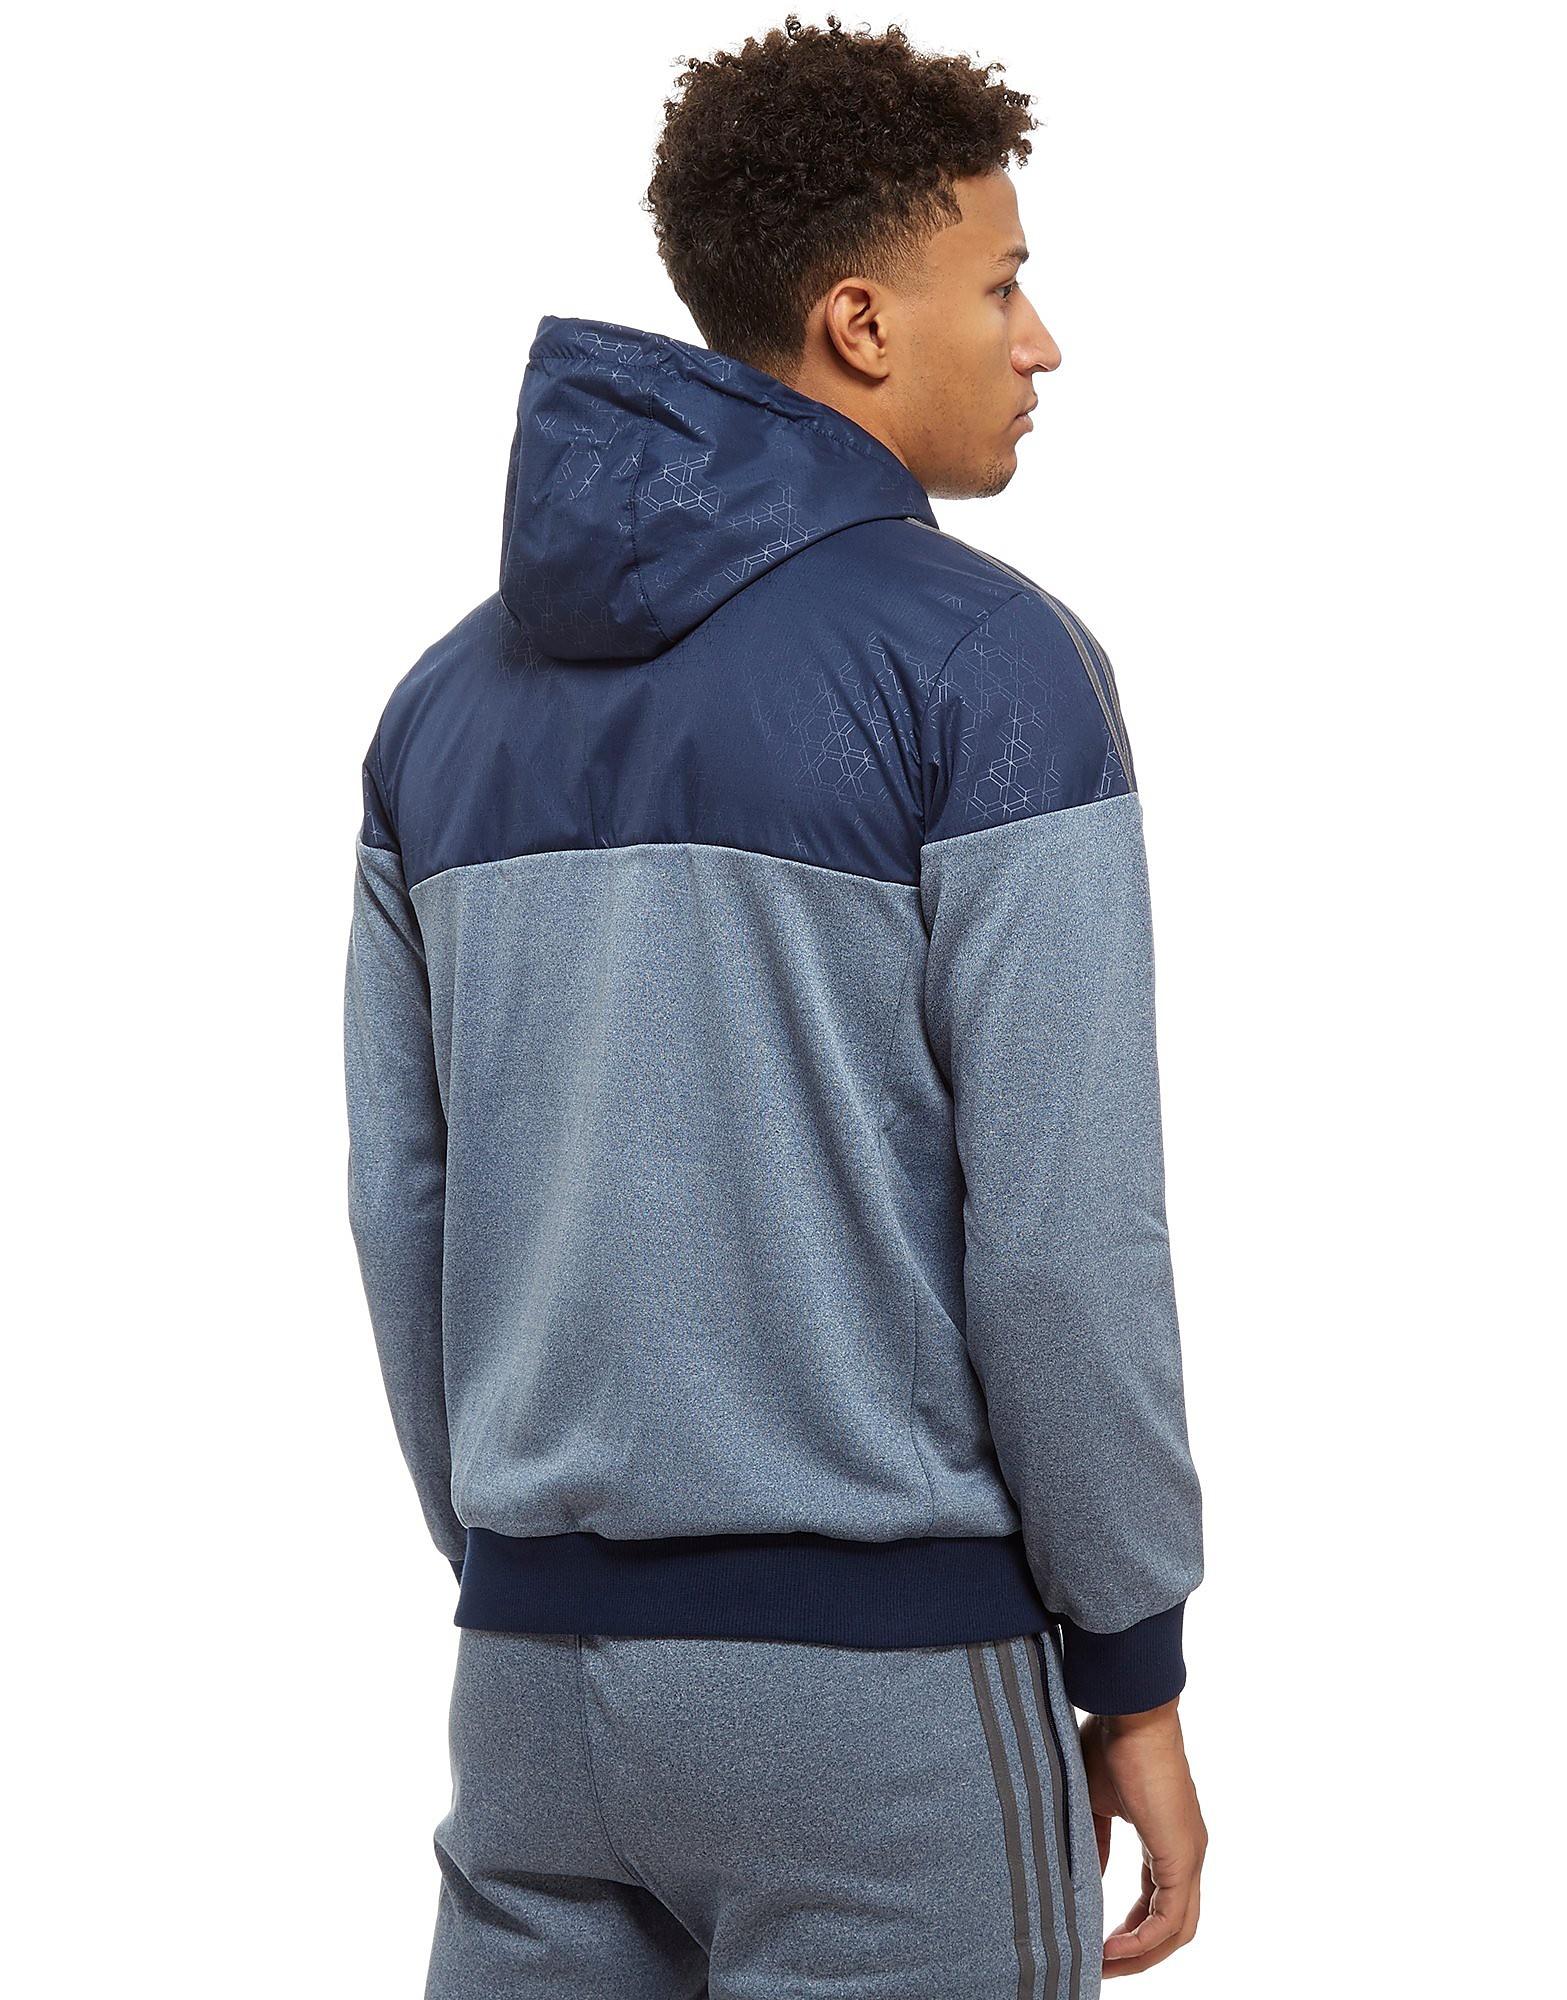 adidas Originals NMD Full Zip Hoodie